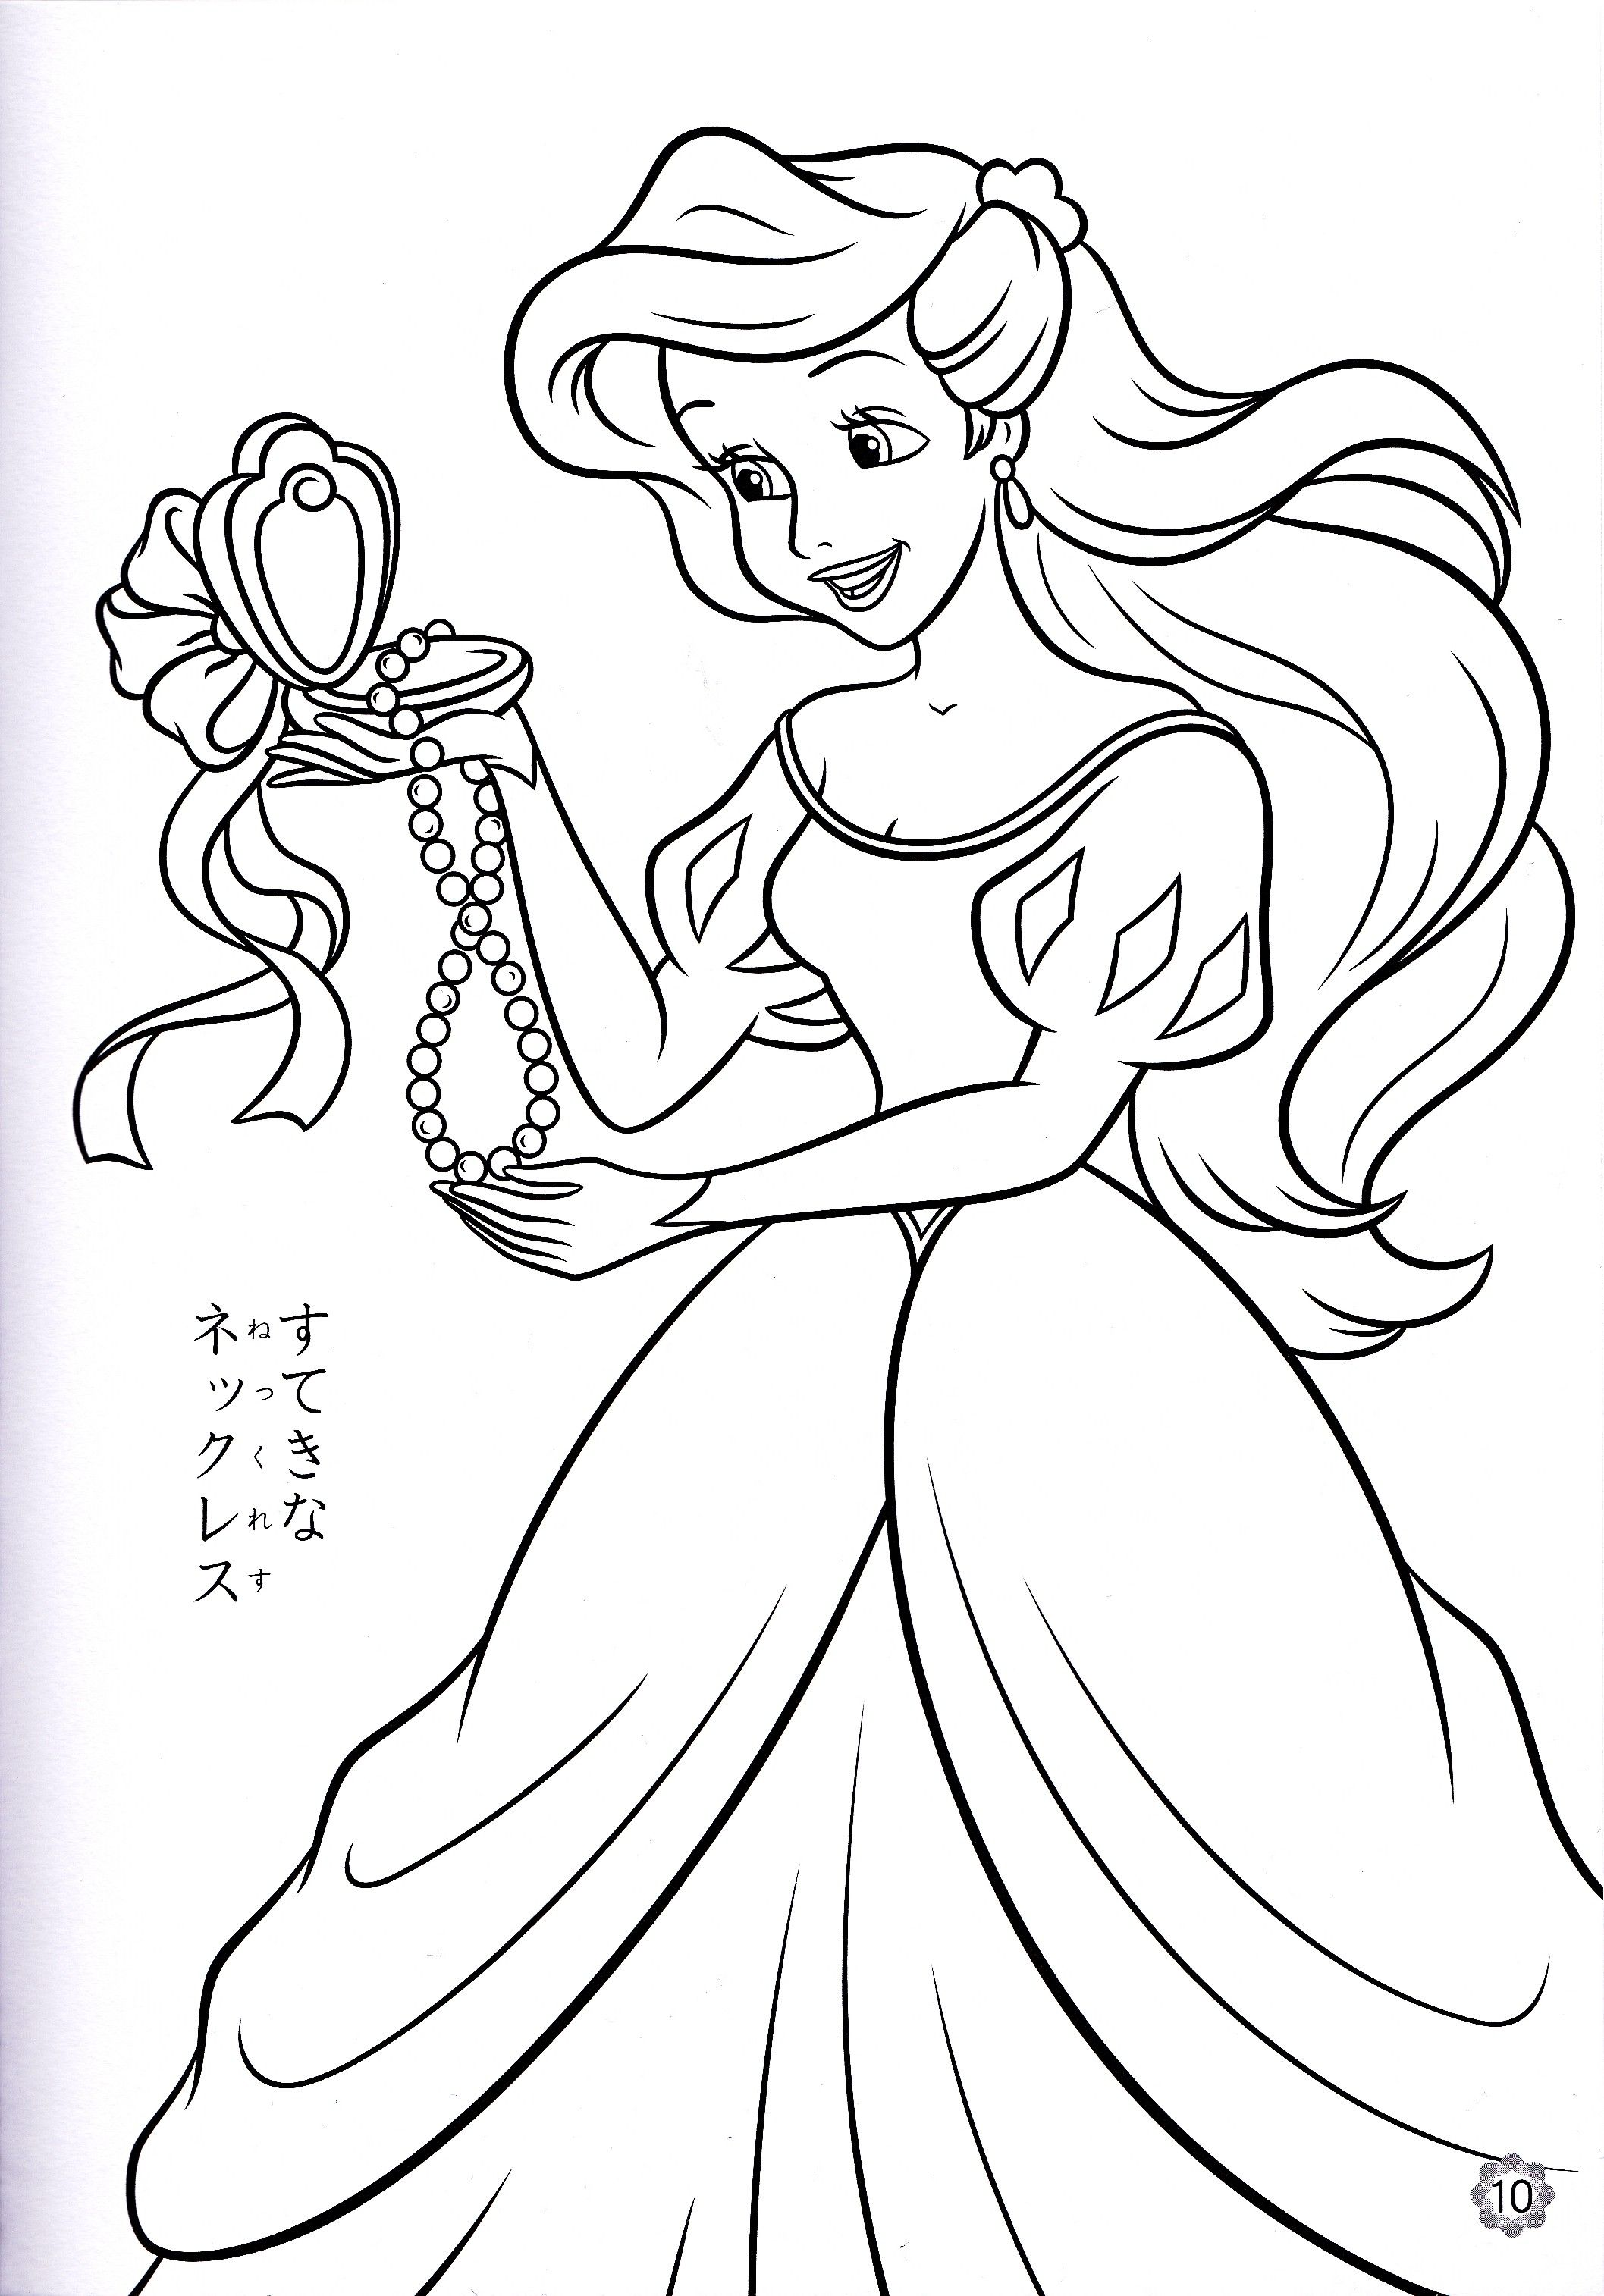 Disney Princess Mermaid Coloring Pages Amazing Design